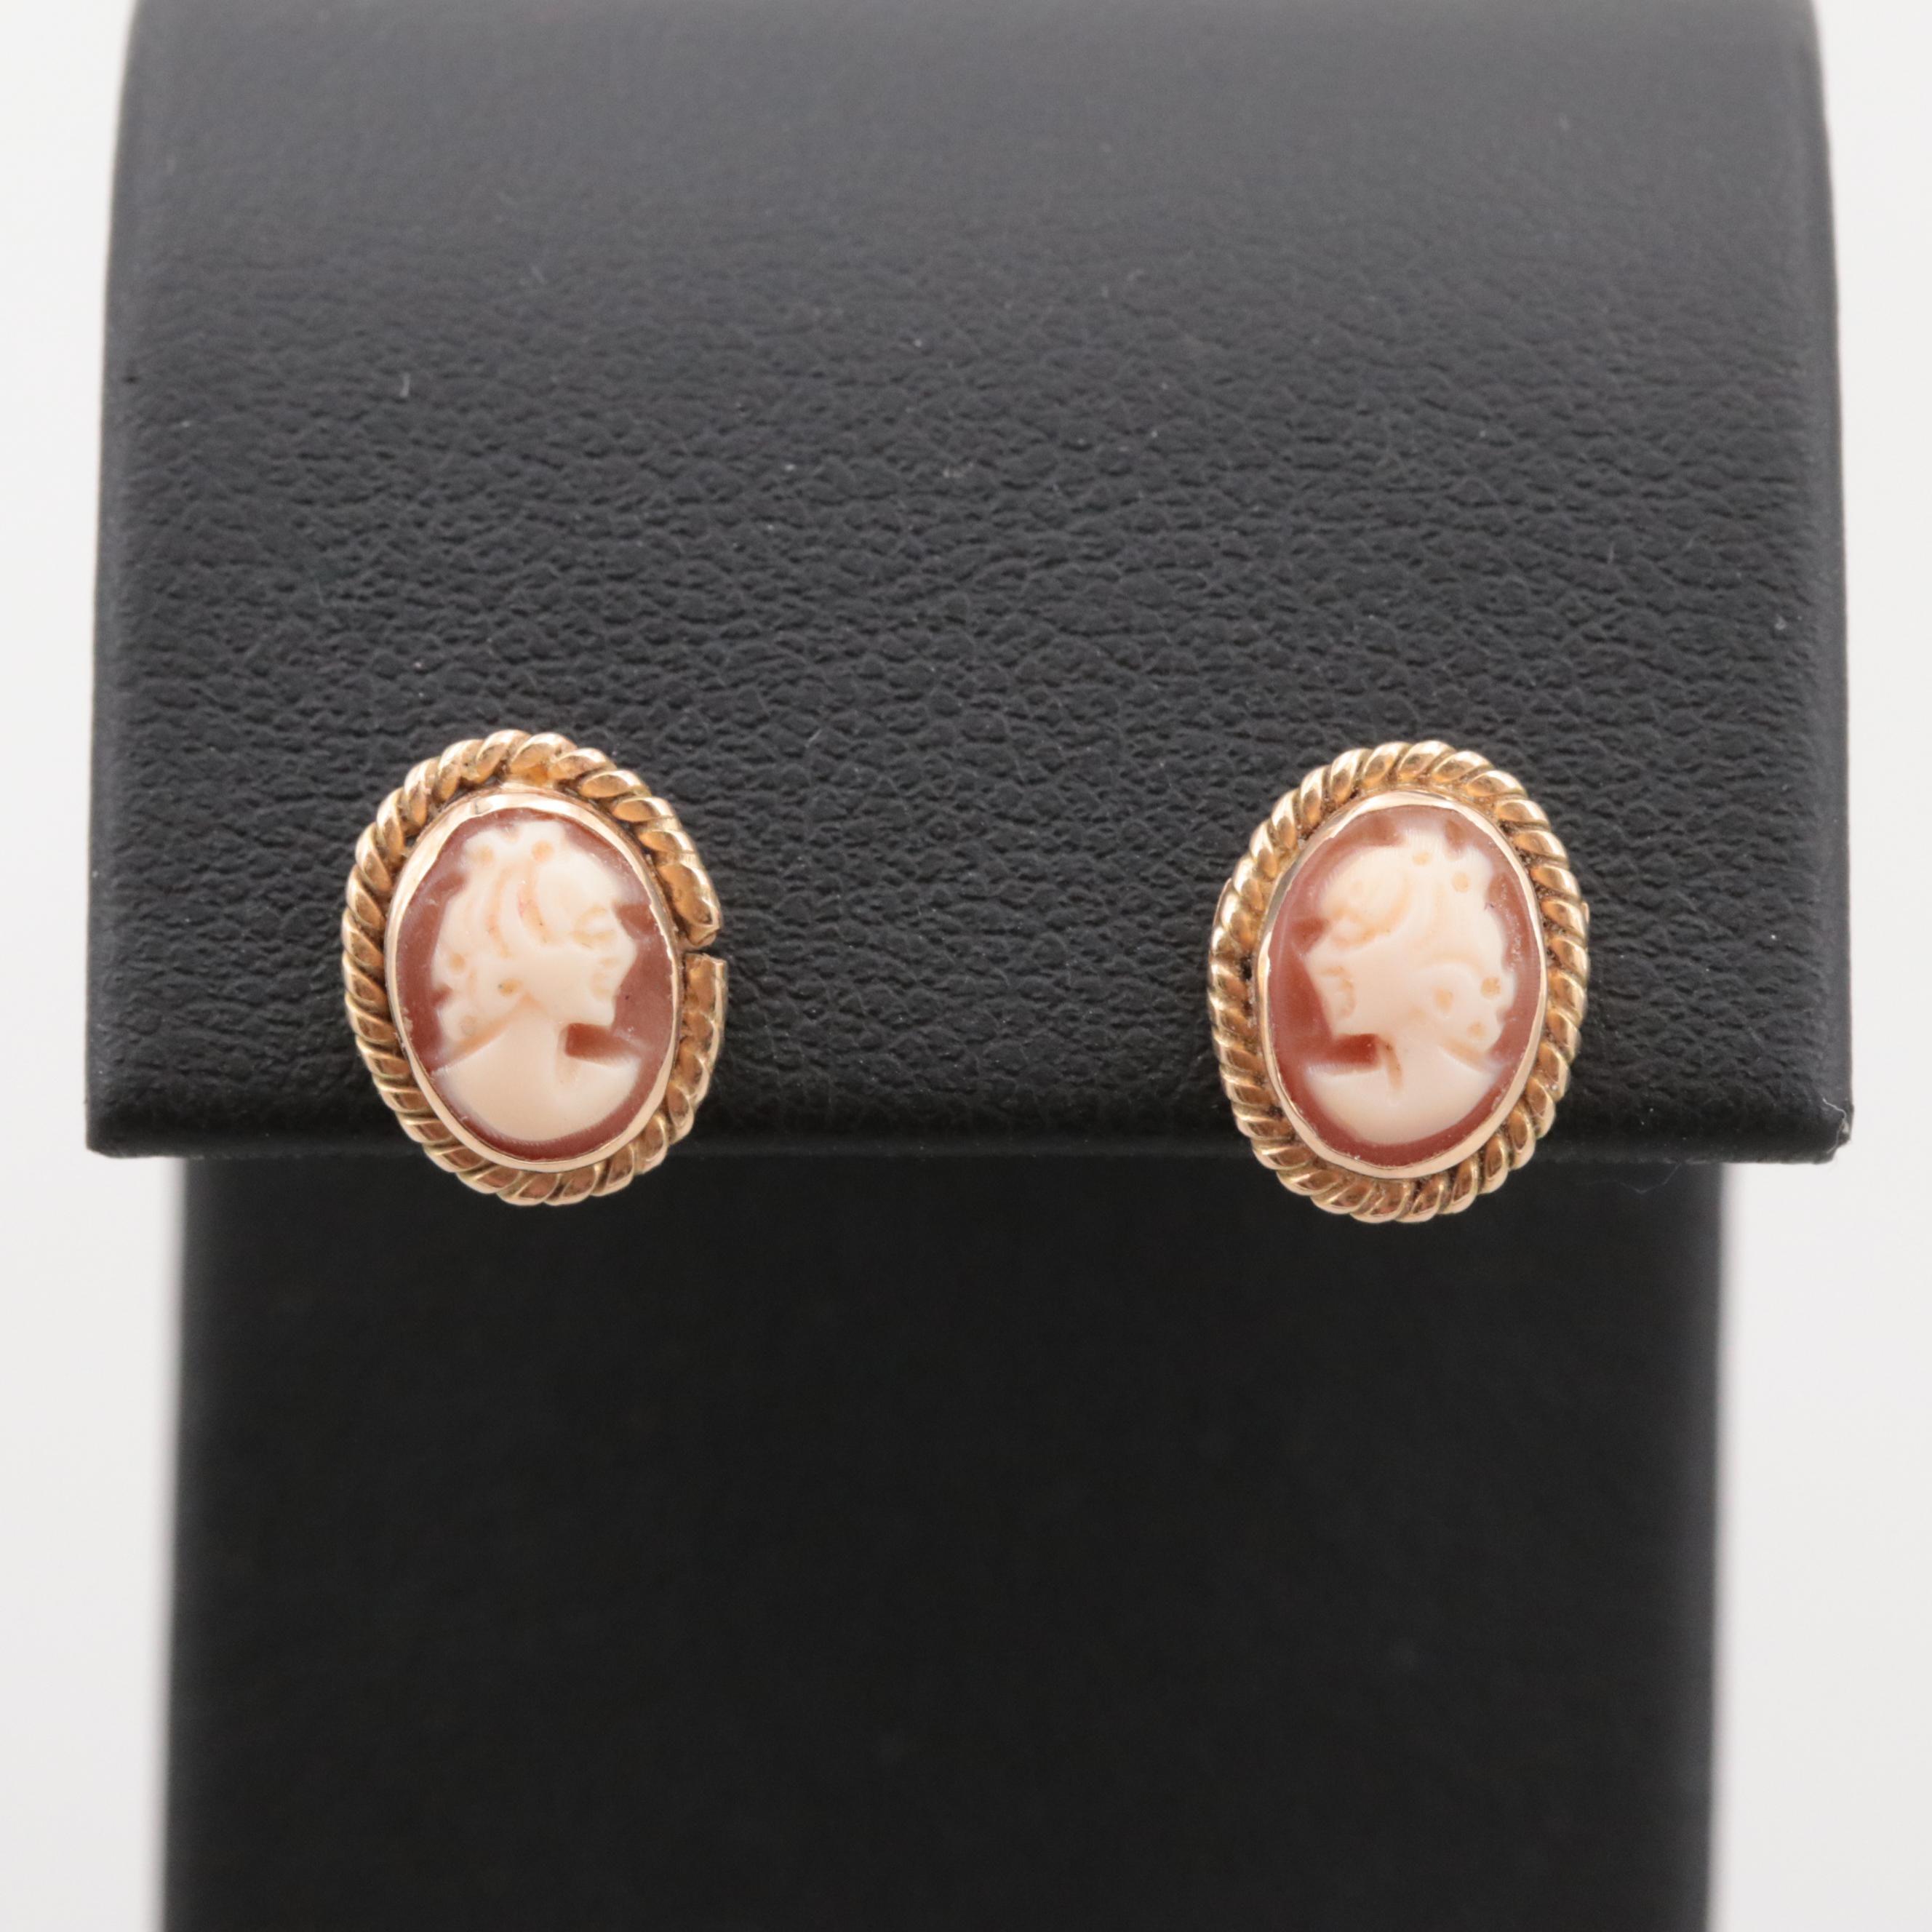 14K Yellow Gold Shell Cameo Stud Earrings